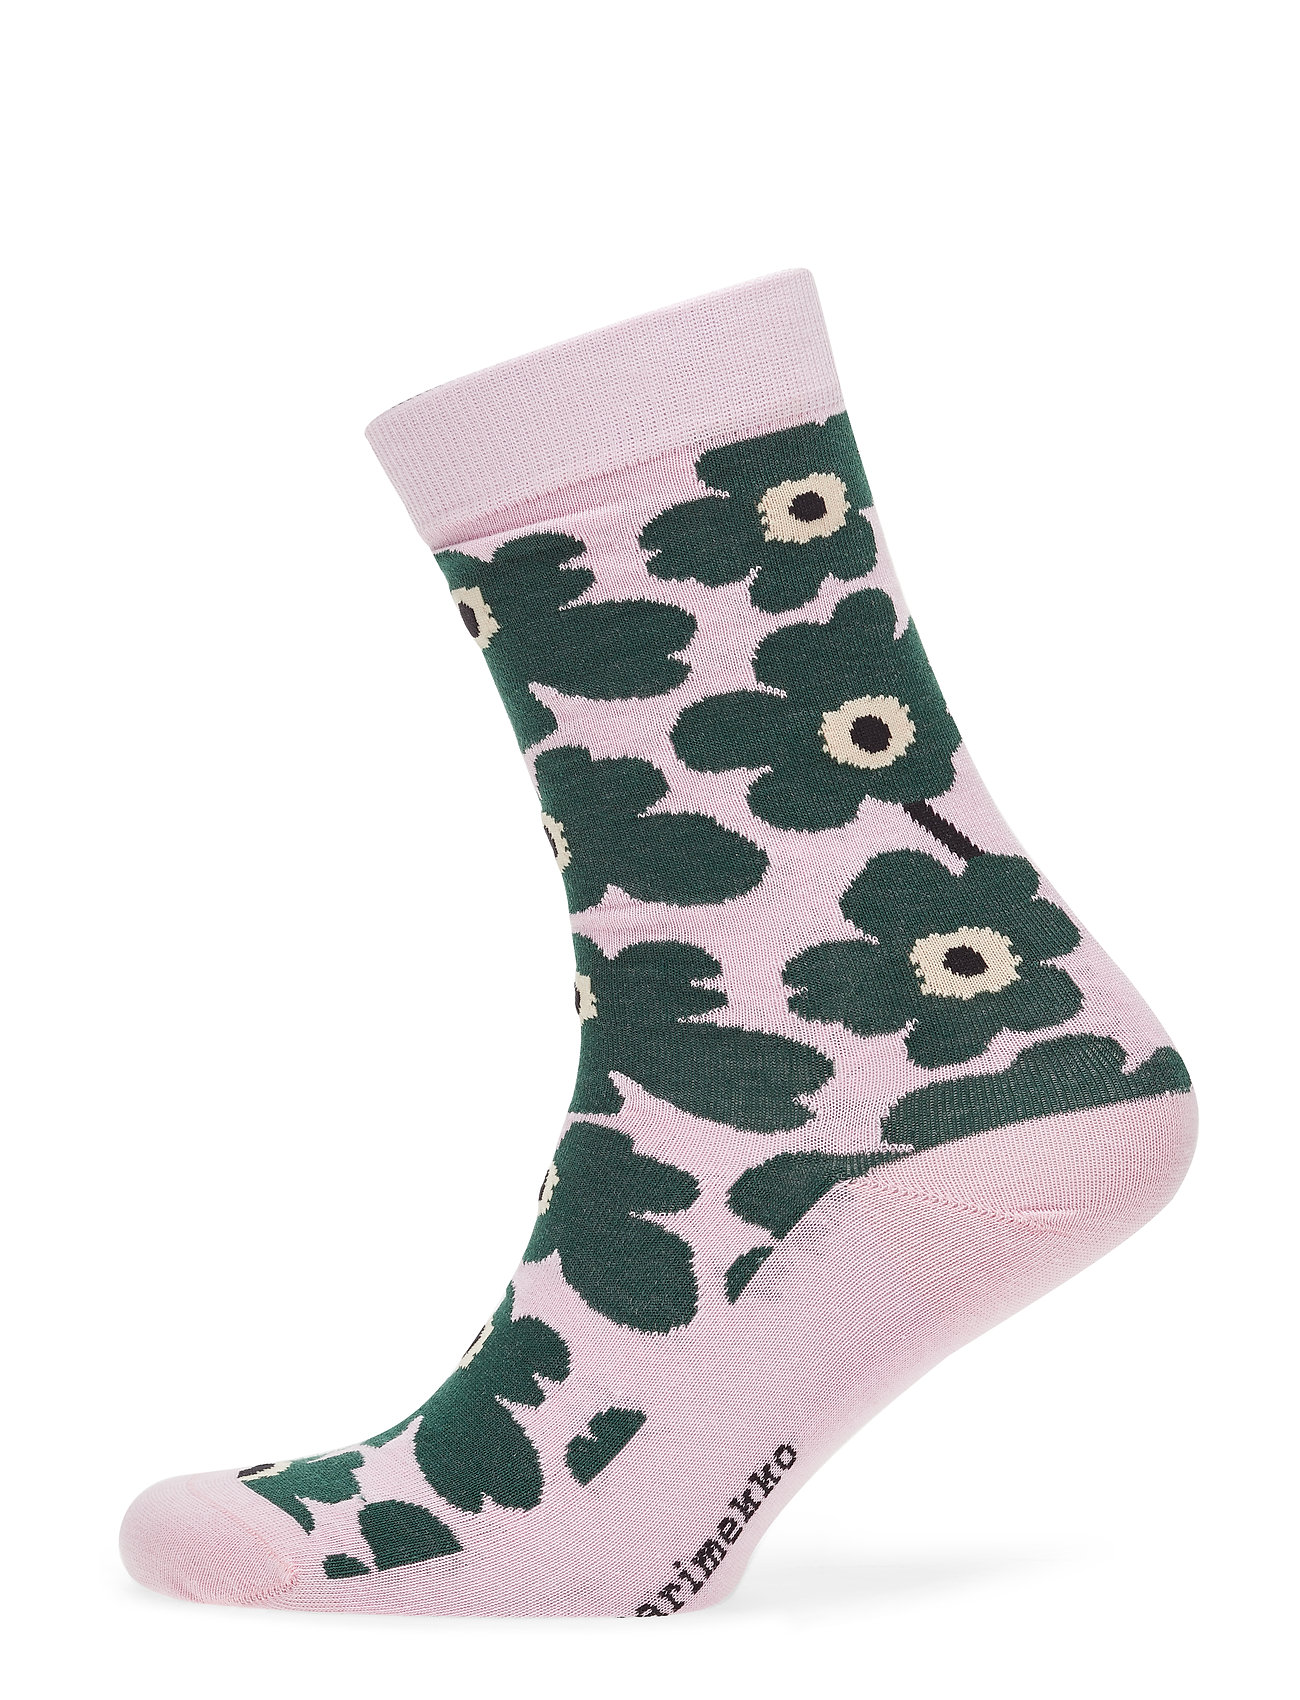 Marimekko HIETA Ankle socks - PINK, DARK GREEN, BLACK